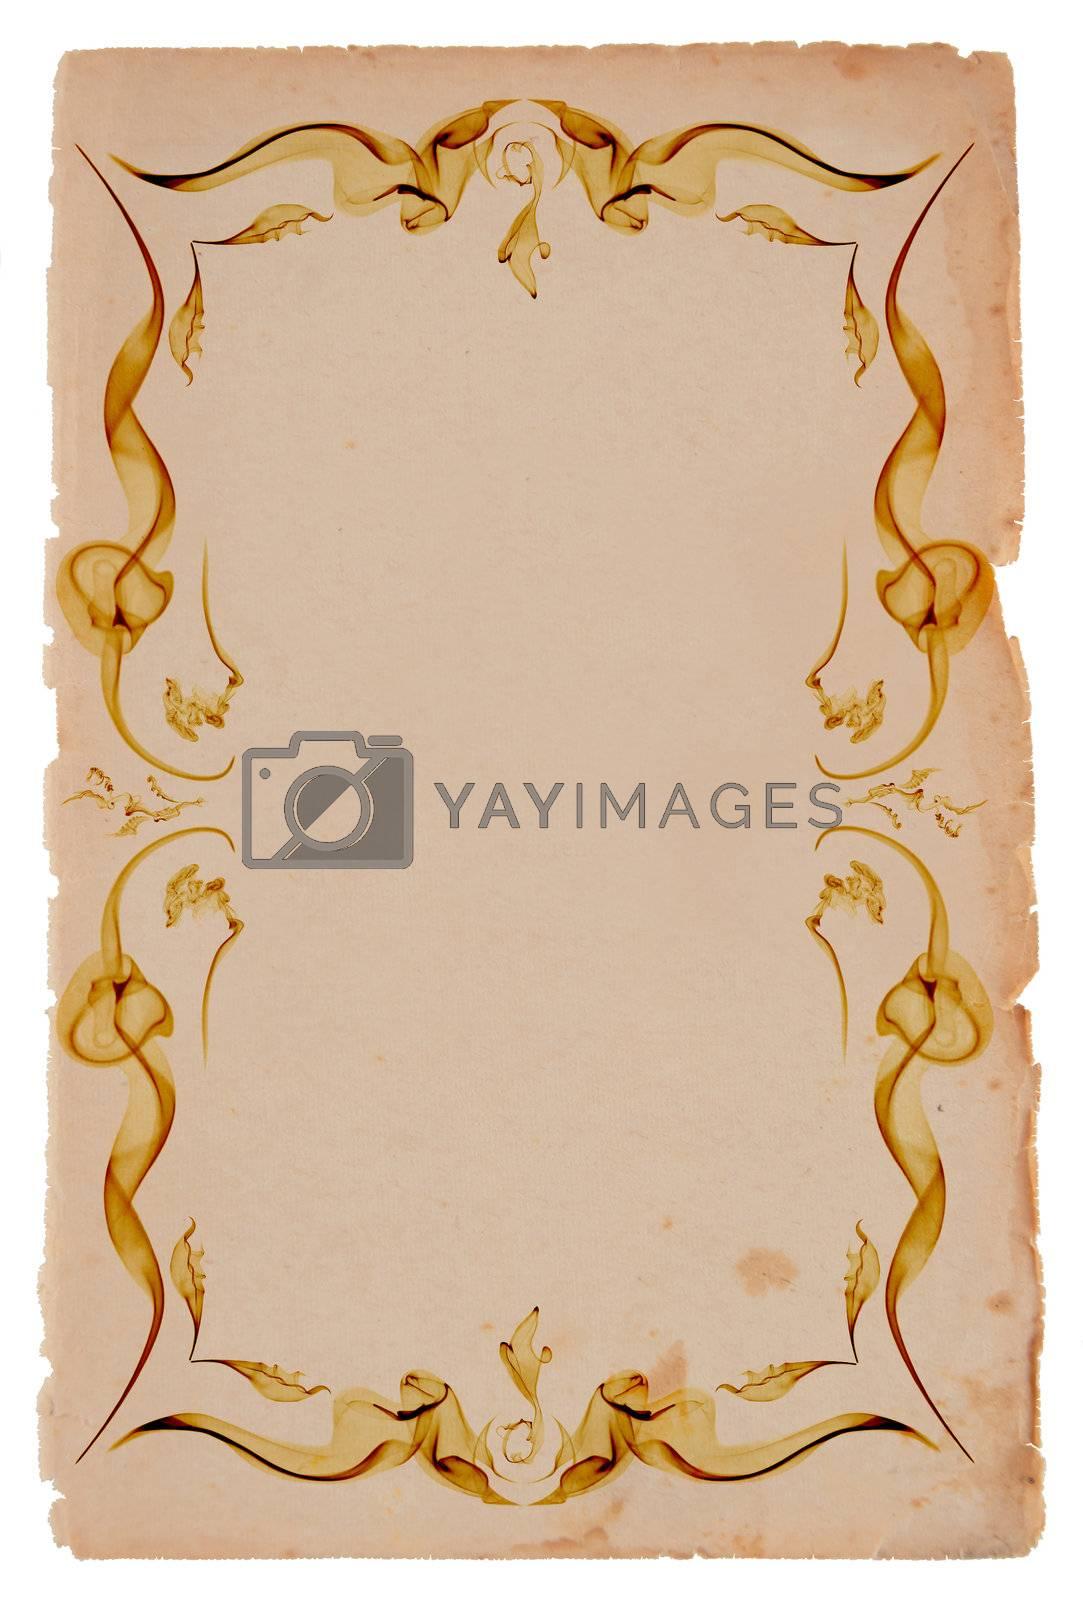 Old paper frame on white background